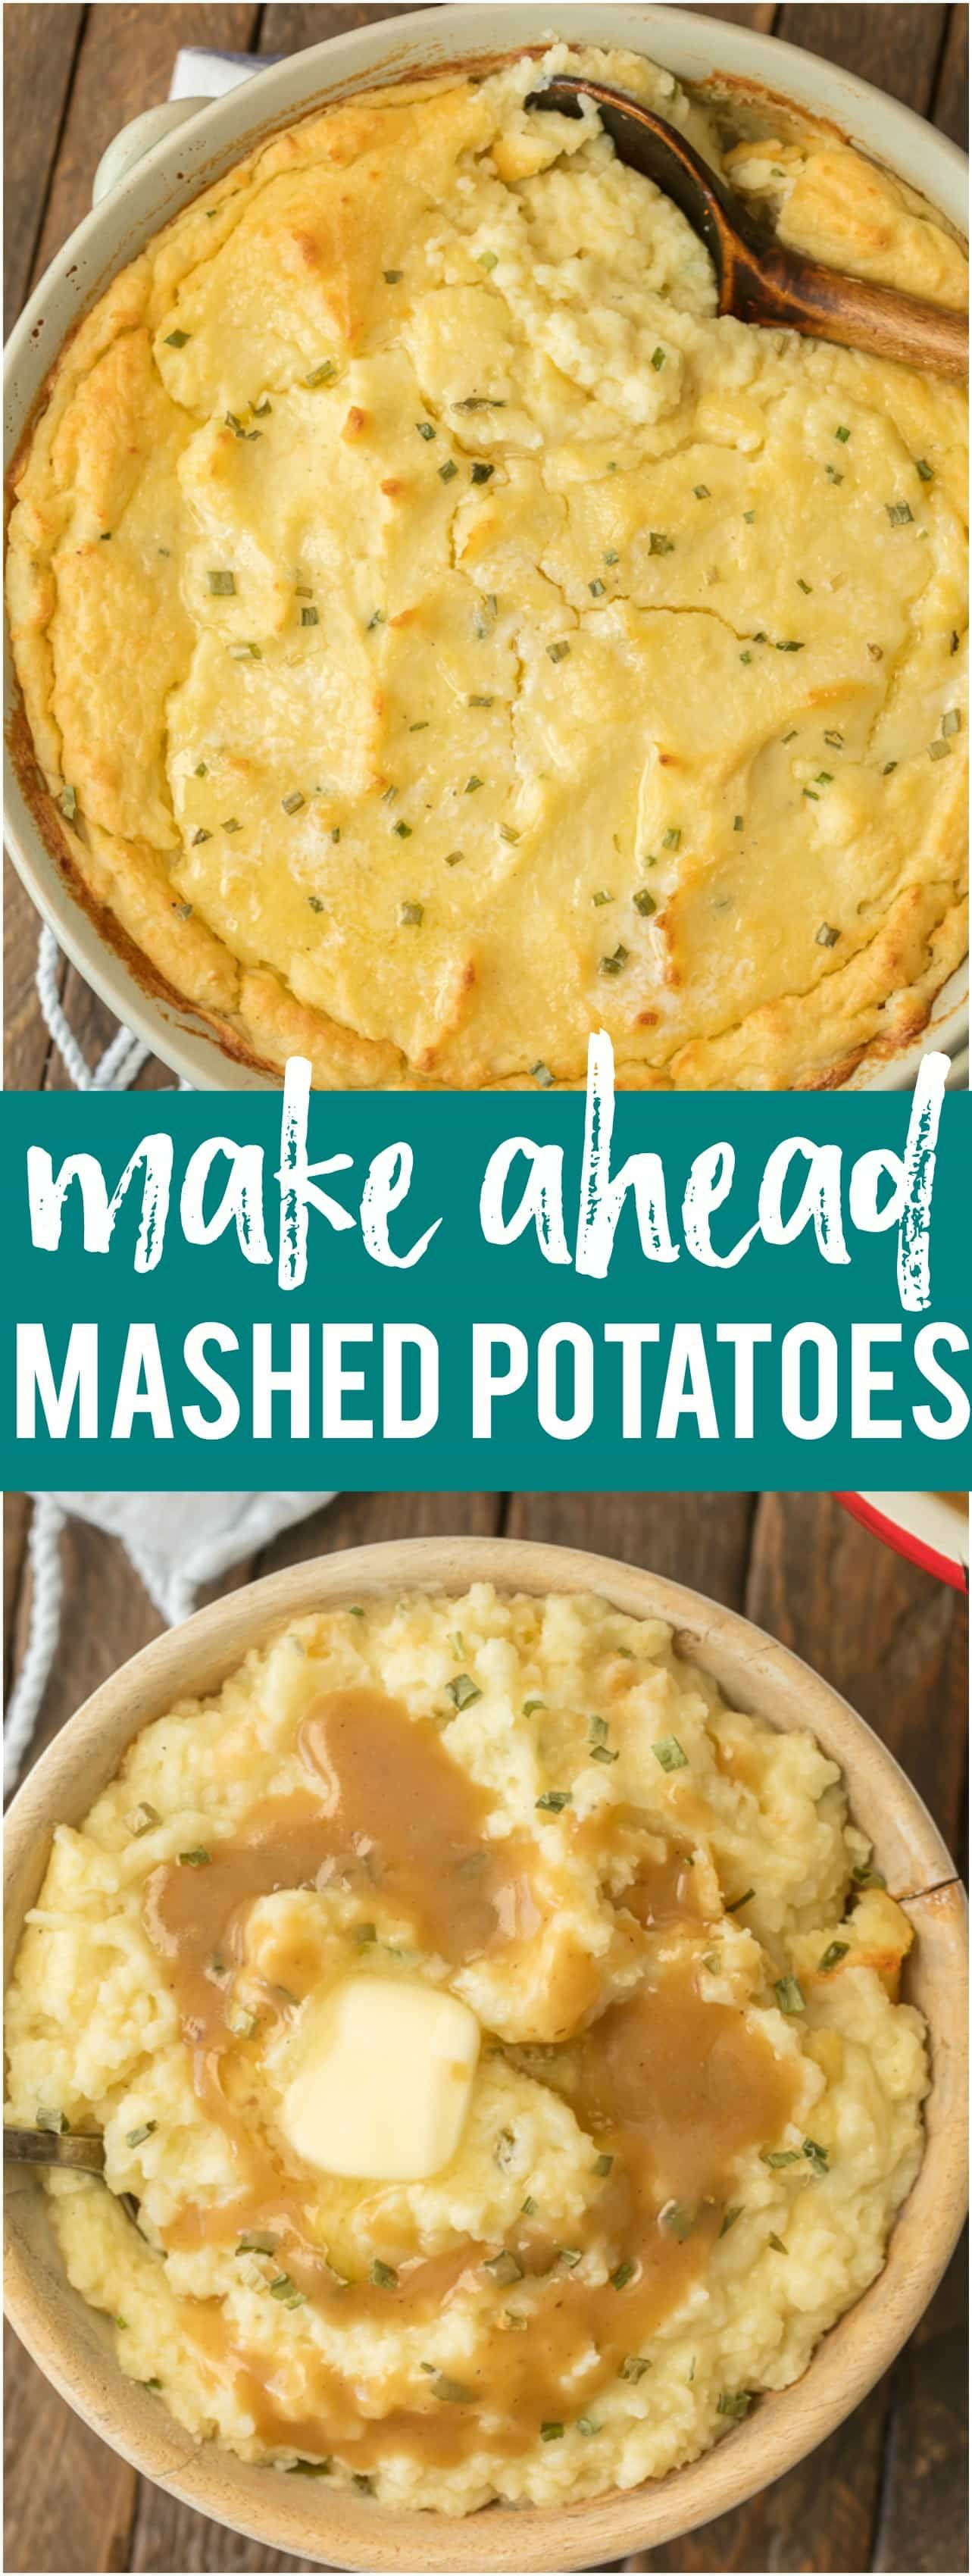 Pioneer Woman Thanksgiving Mashed Potatoes  Make Ahead Mashed Potatoes Recipe